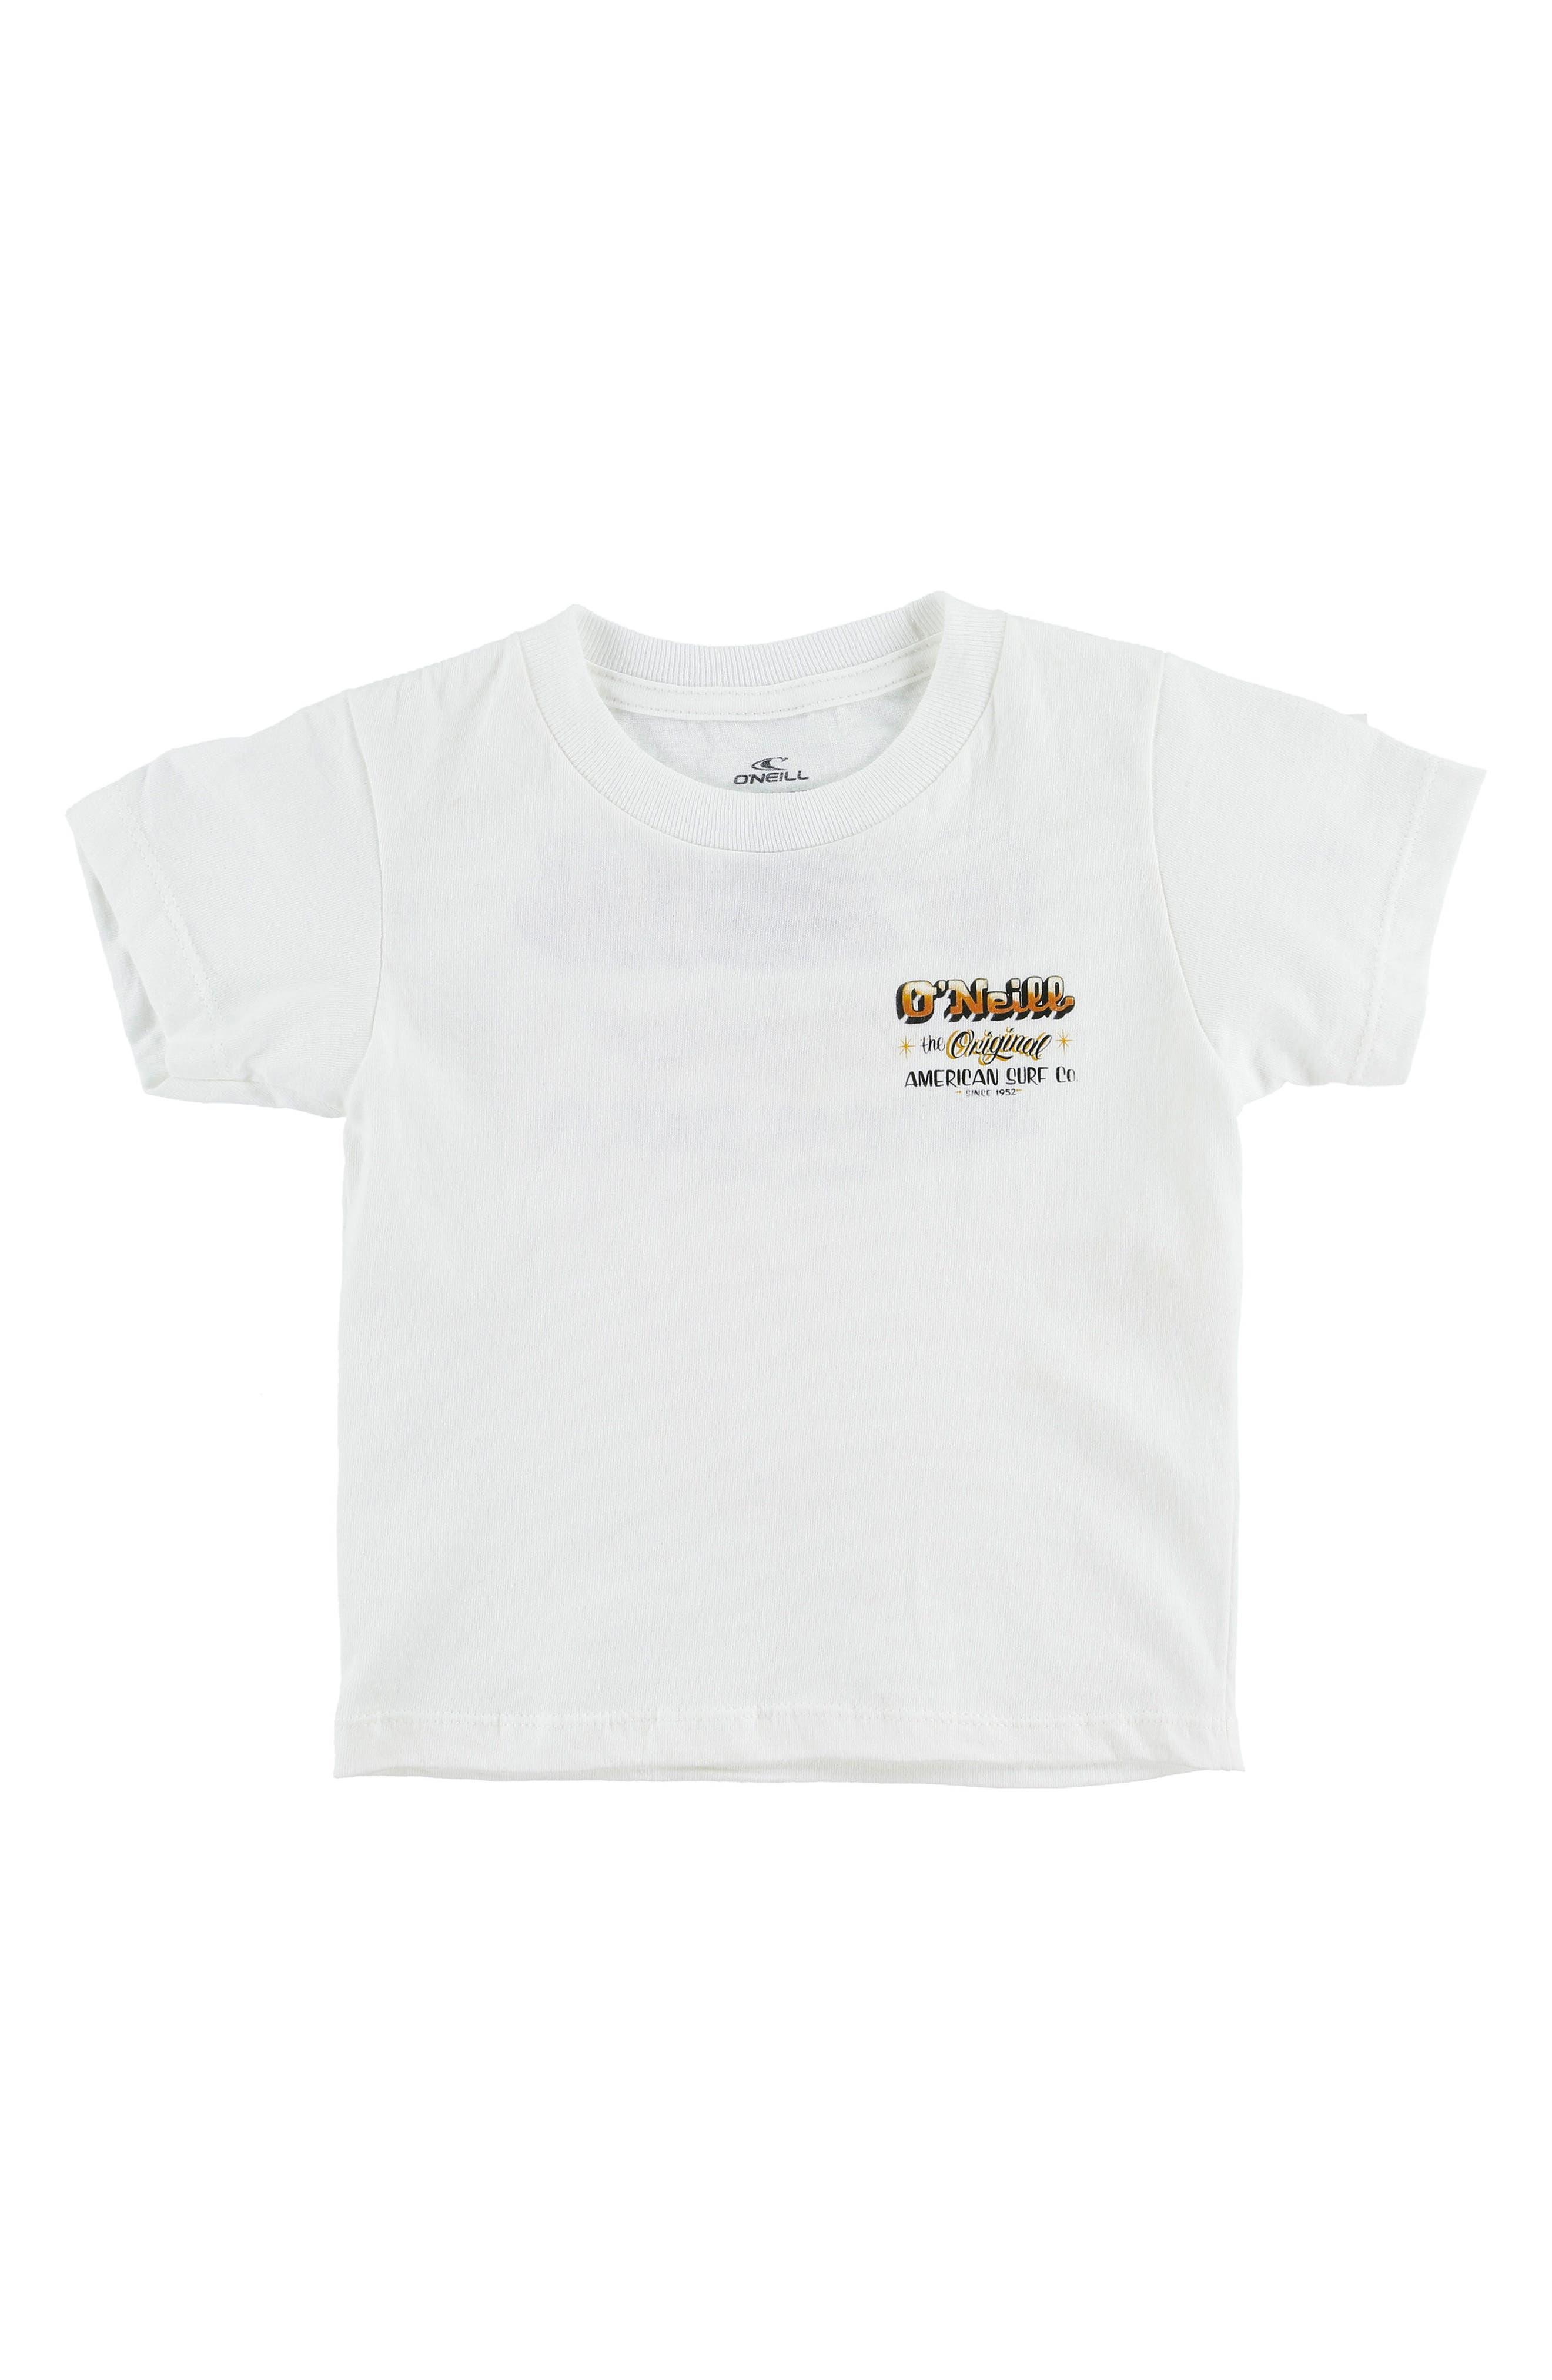 Tuki Graphic T-Shirt,                         Main,                         color, White